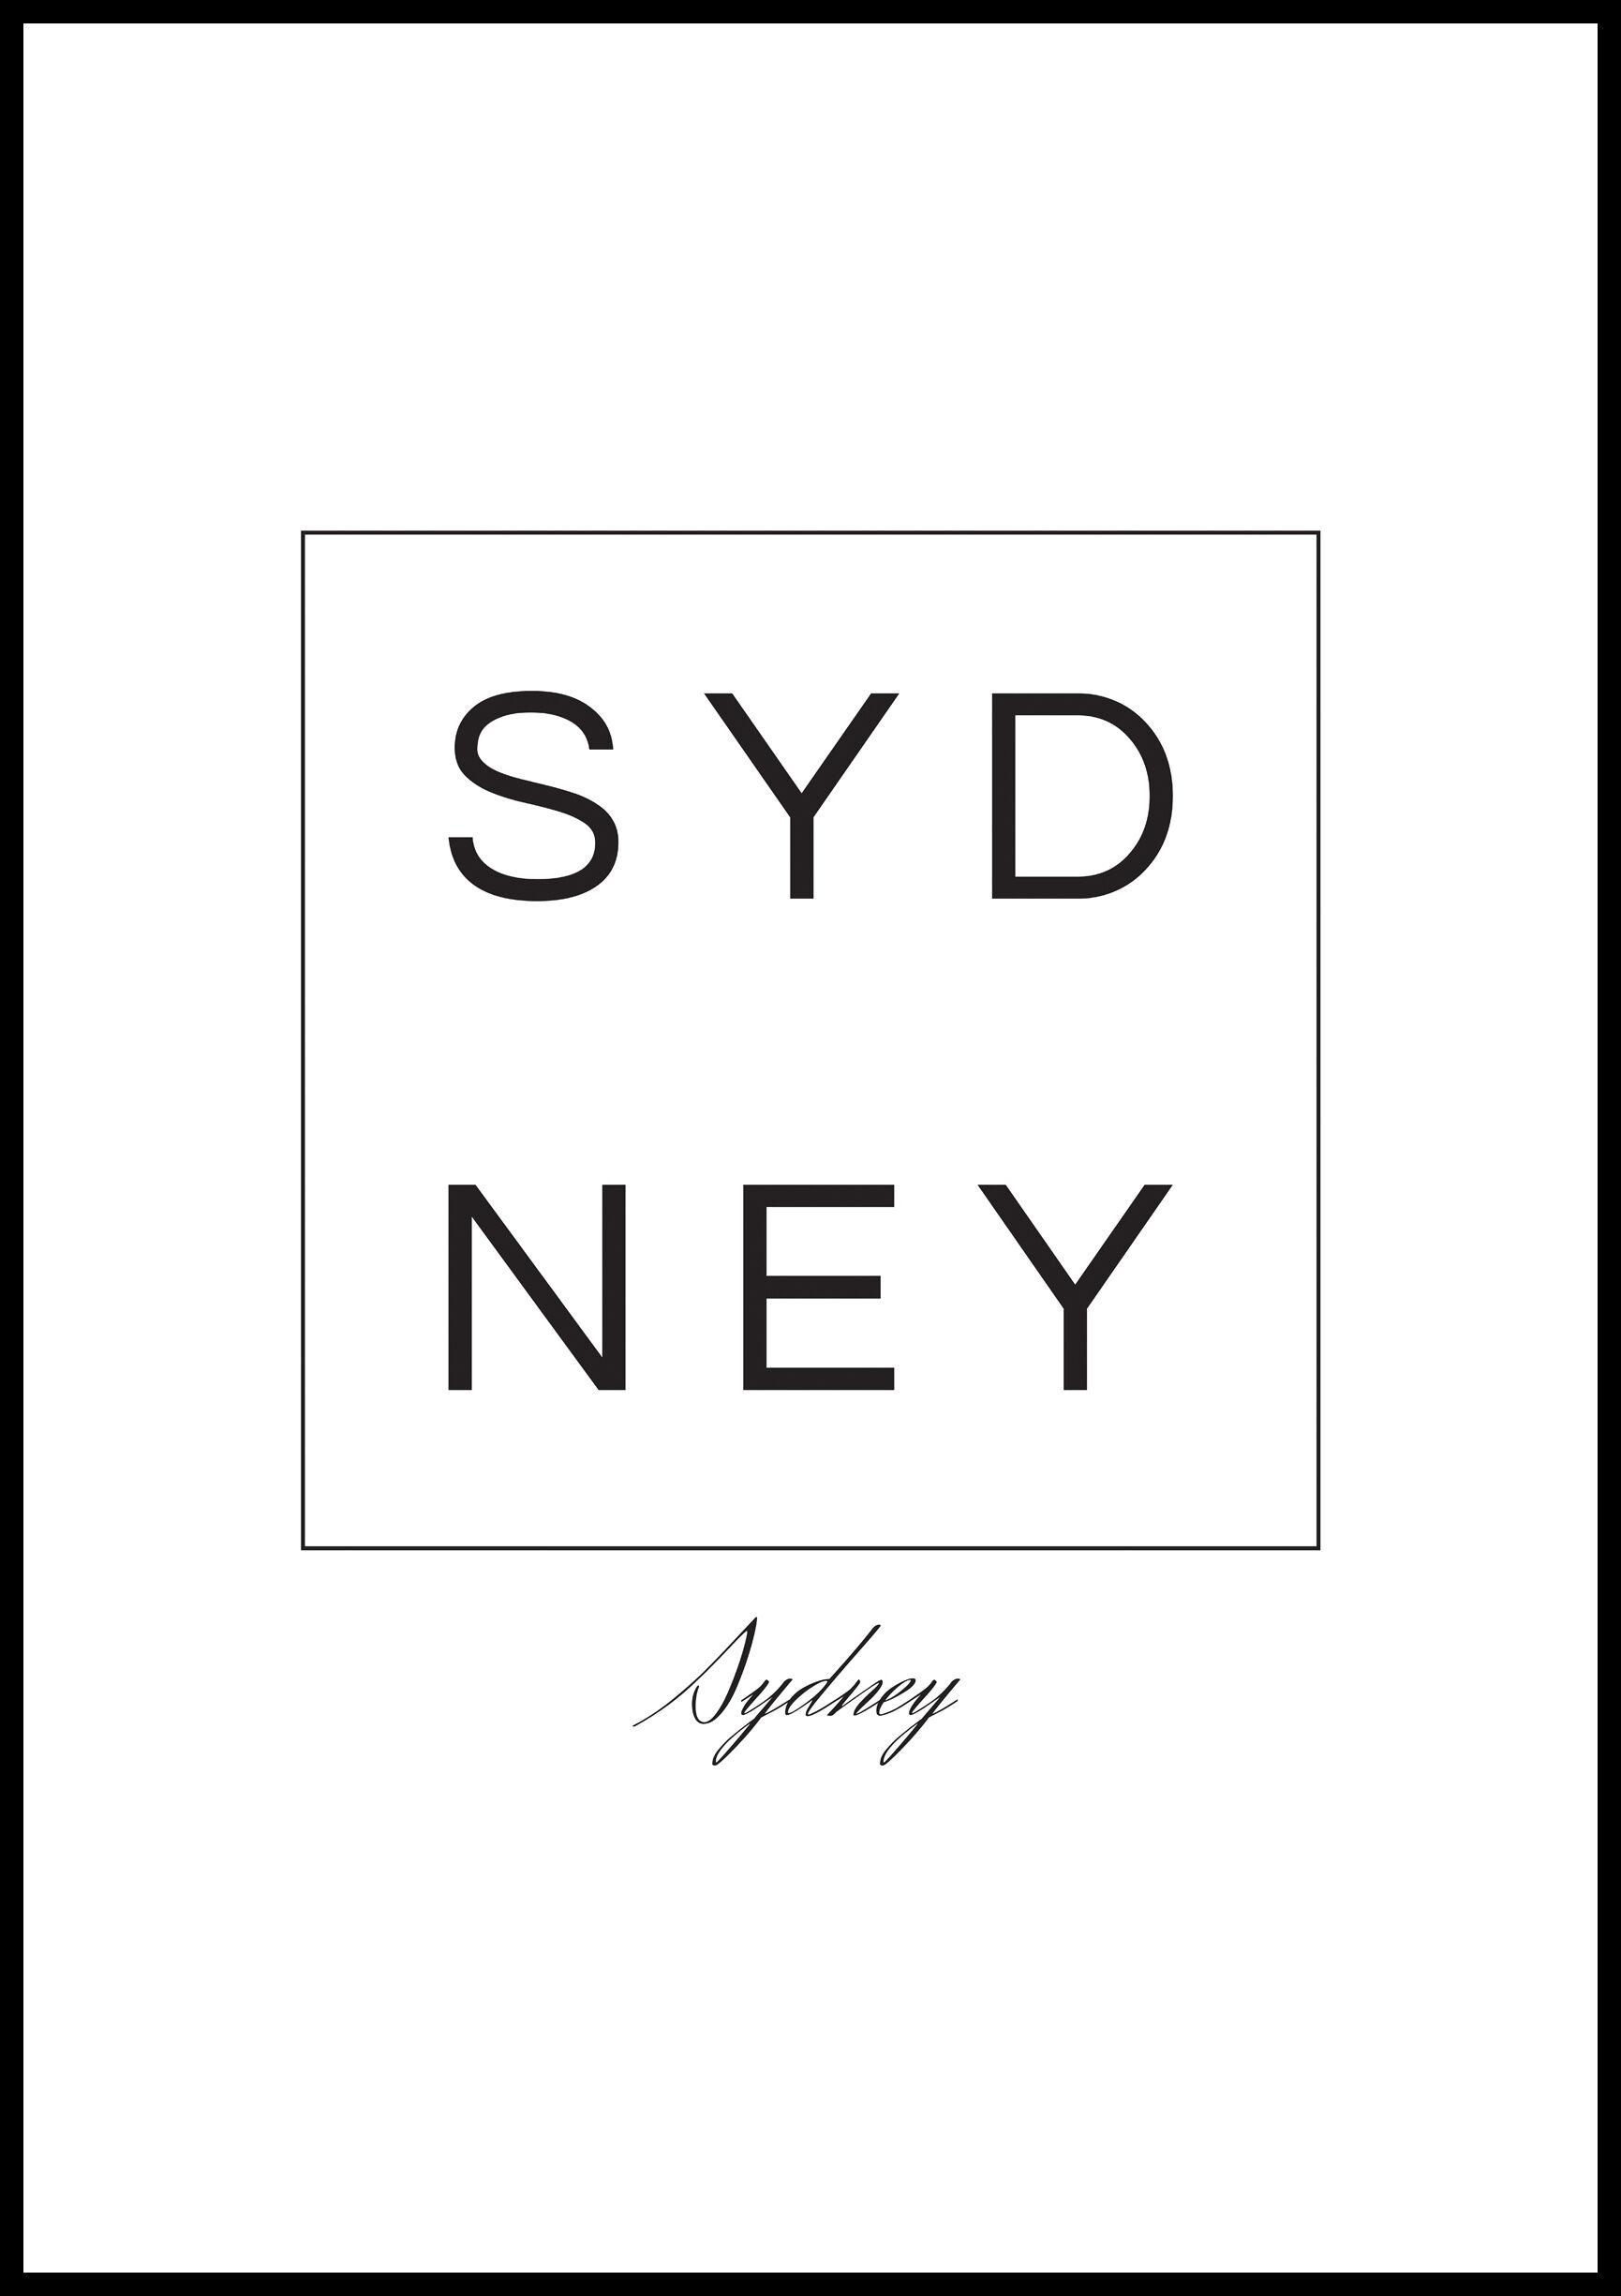 Bildverkstad Sydney - Posteri